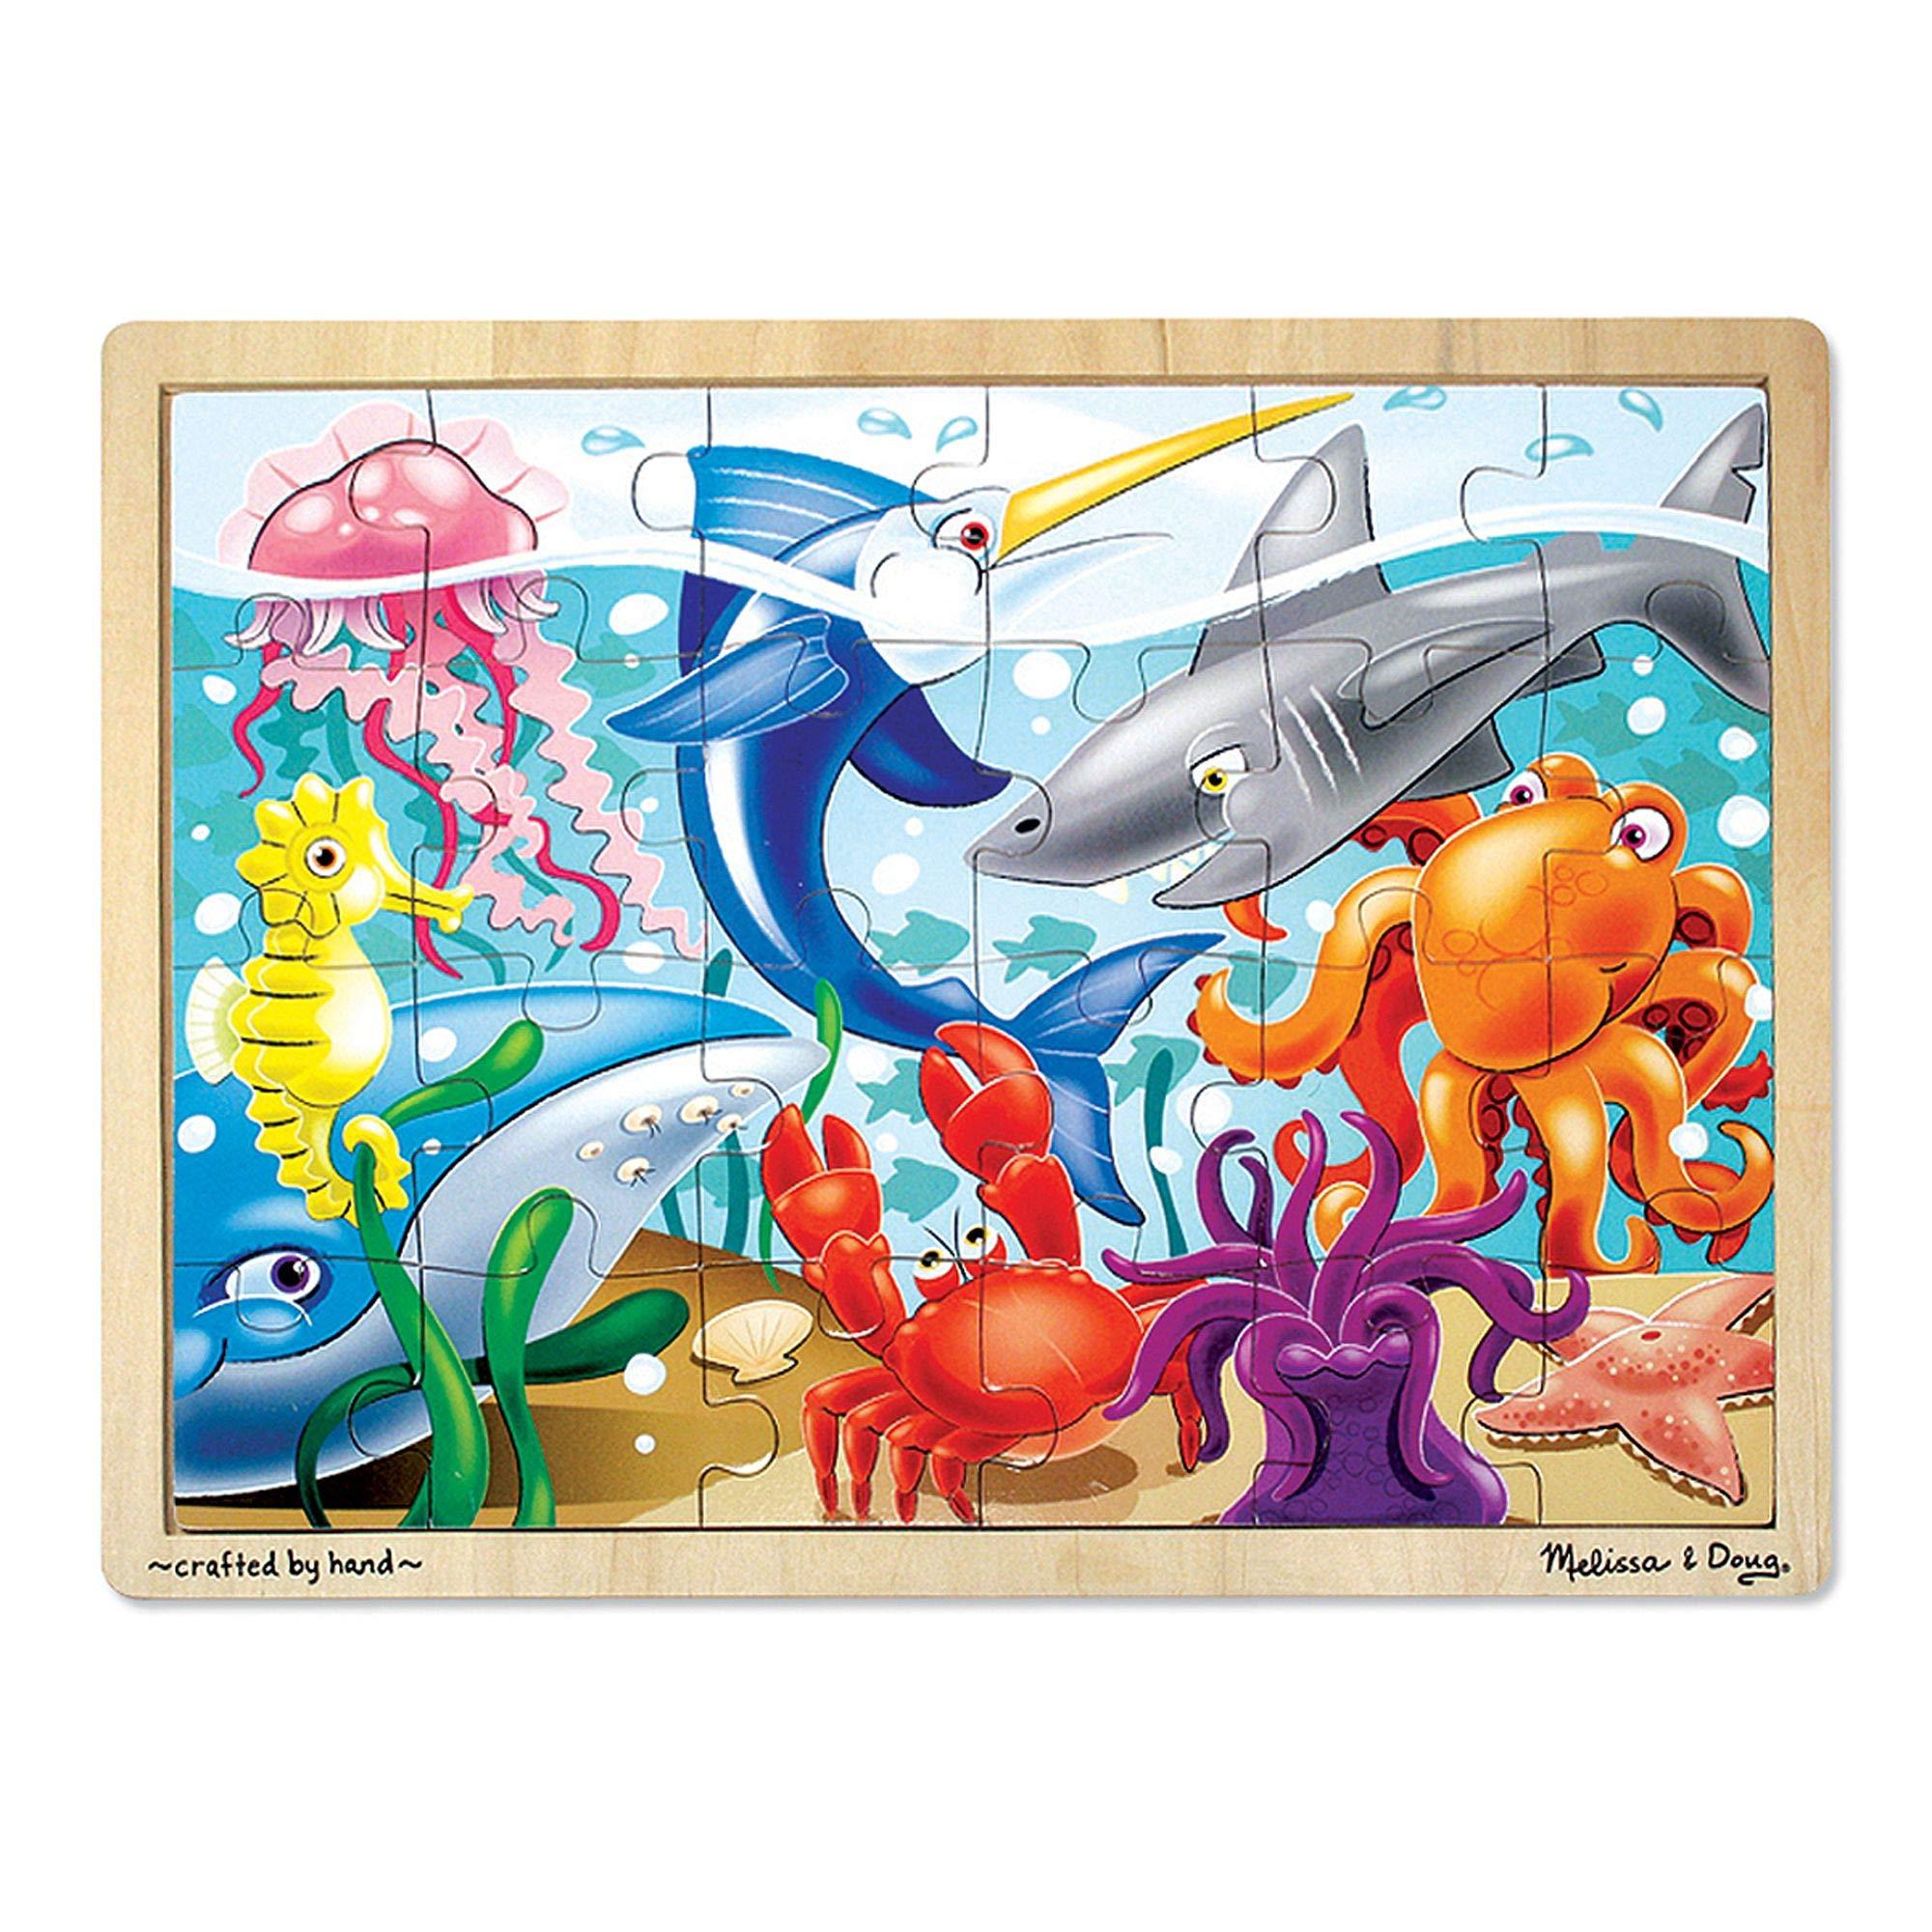 Melissa & Doug Under the Sea Jigsaw Puzzle 24 pc